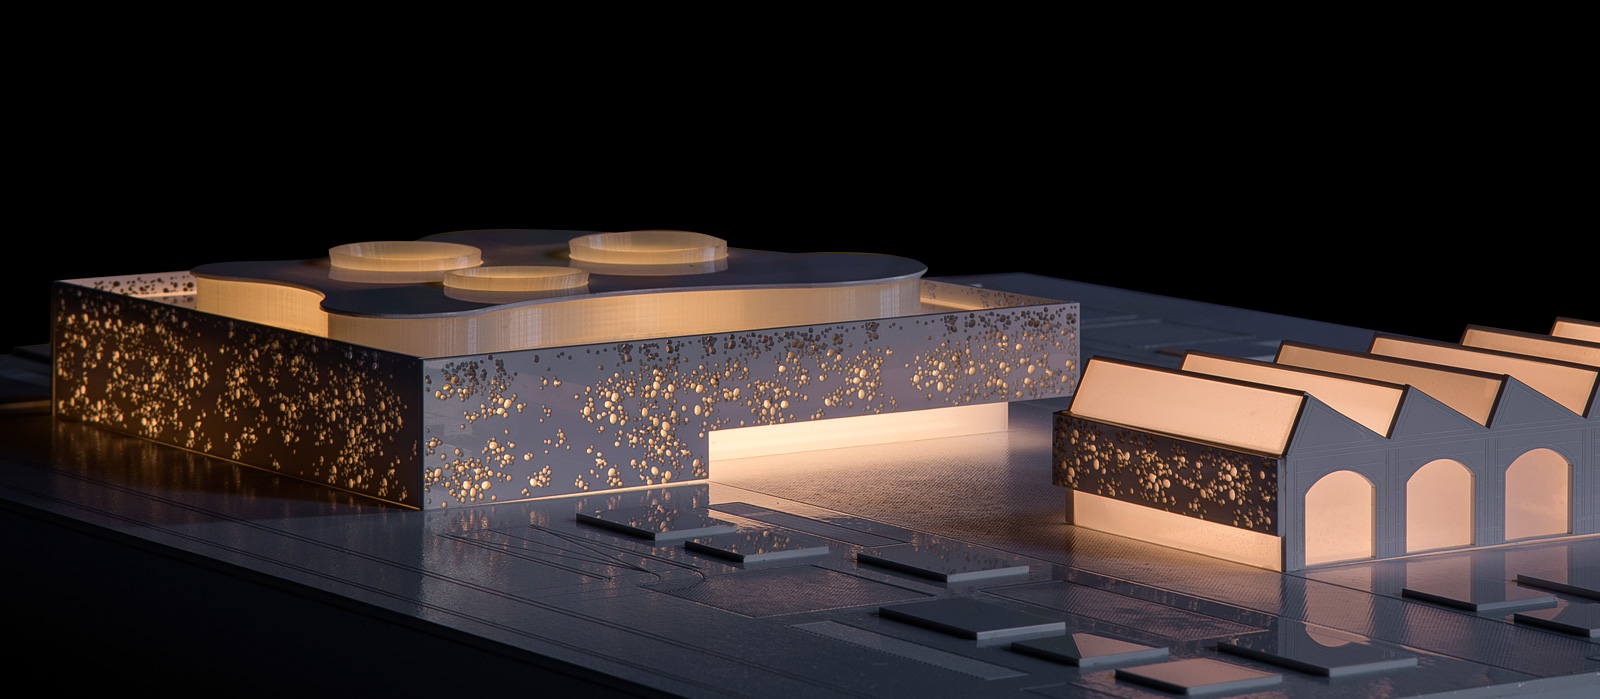 maqueta-arquitectura-concurso-valencia-iluminada-pfc-centro-musical-3